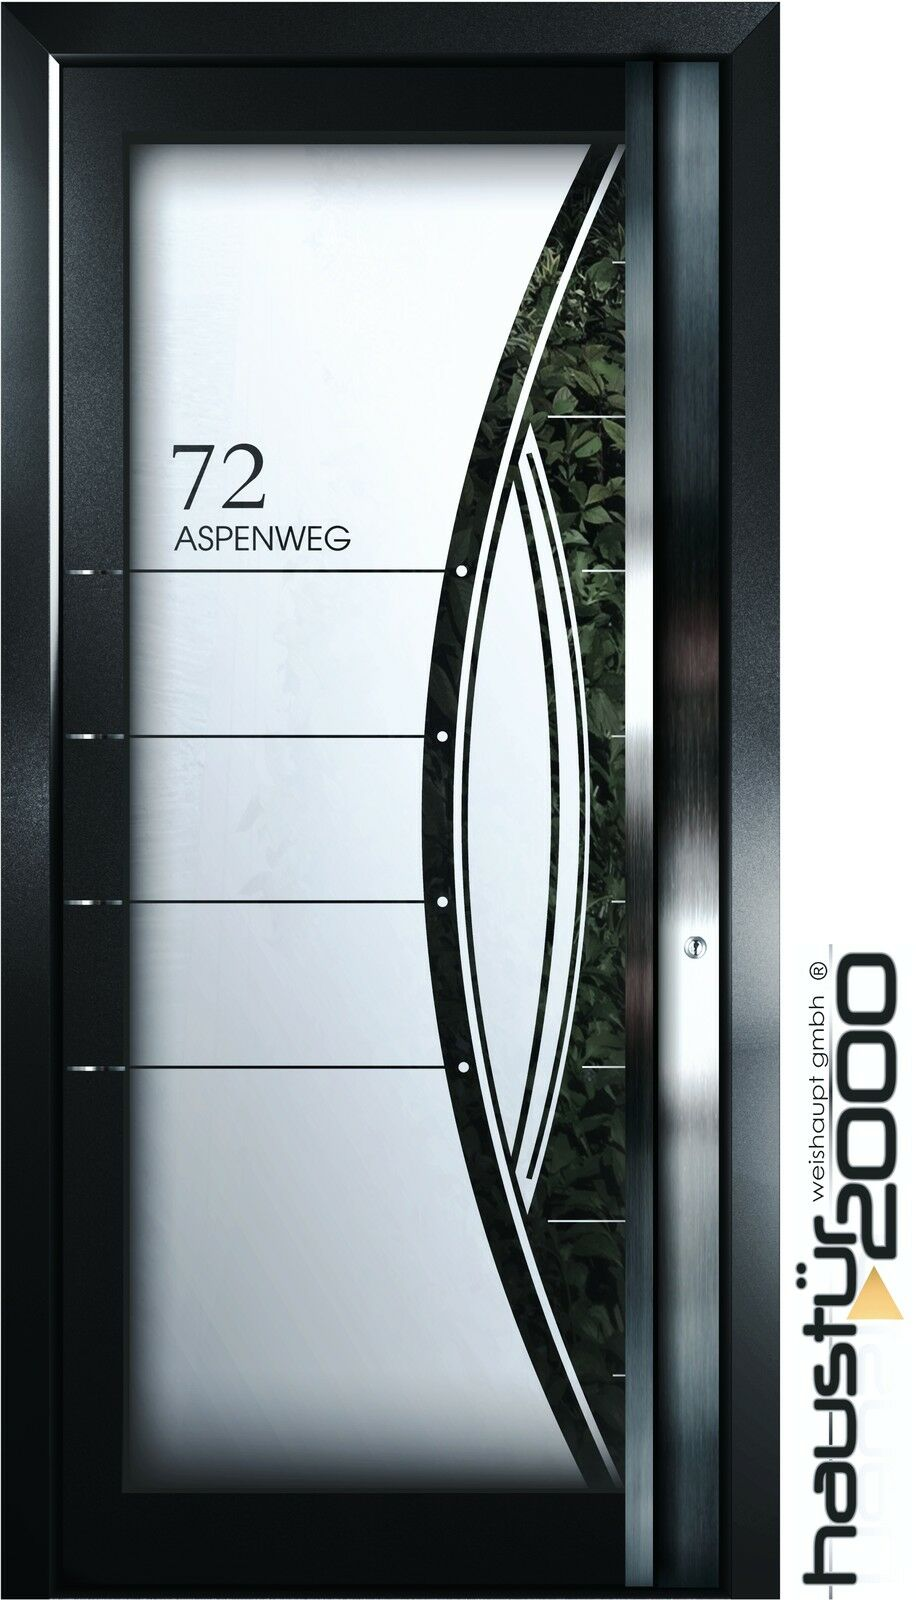 aluminium haust r ganzglasf llung alu t r n ma m ht 5499 gla rs haust r2000 ebay. Black Bedroom Furniture Sets. Home Design Ideas